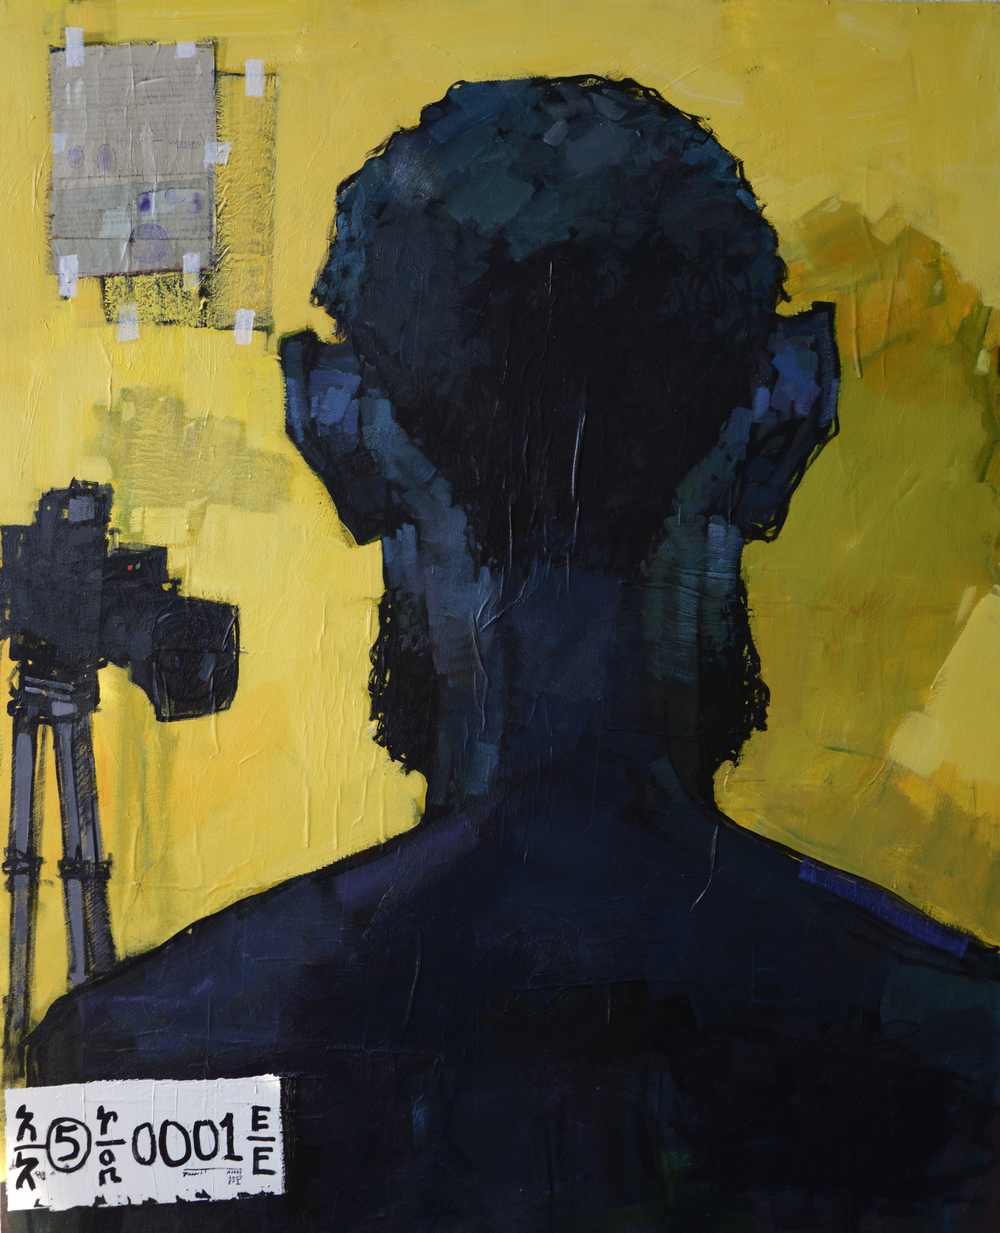 http://artradarjournal.com/2015/06/26/ethiopian-painter-dawit-abebe-interview/